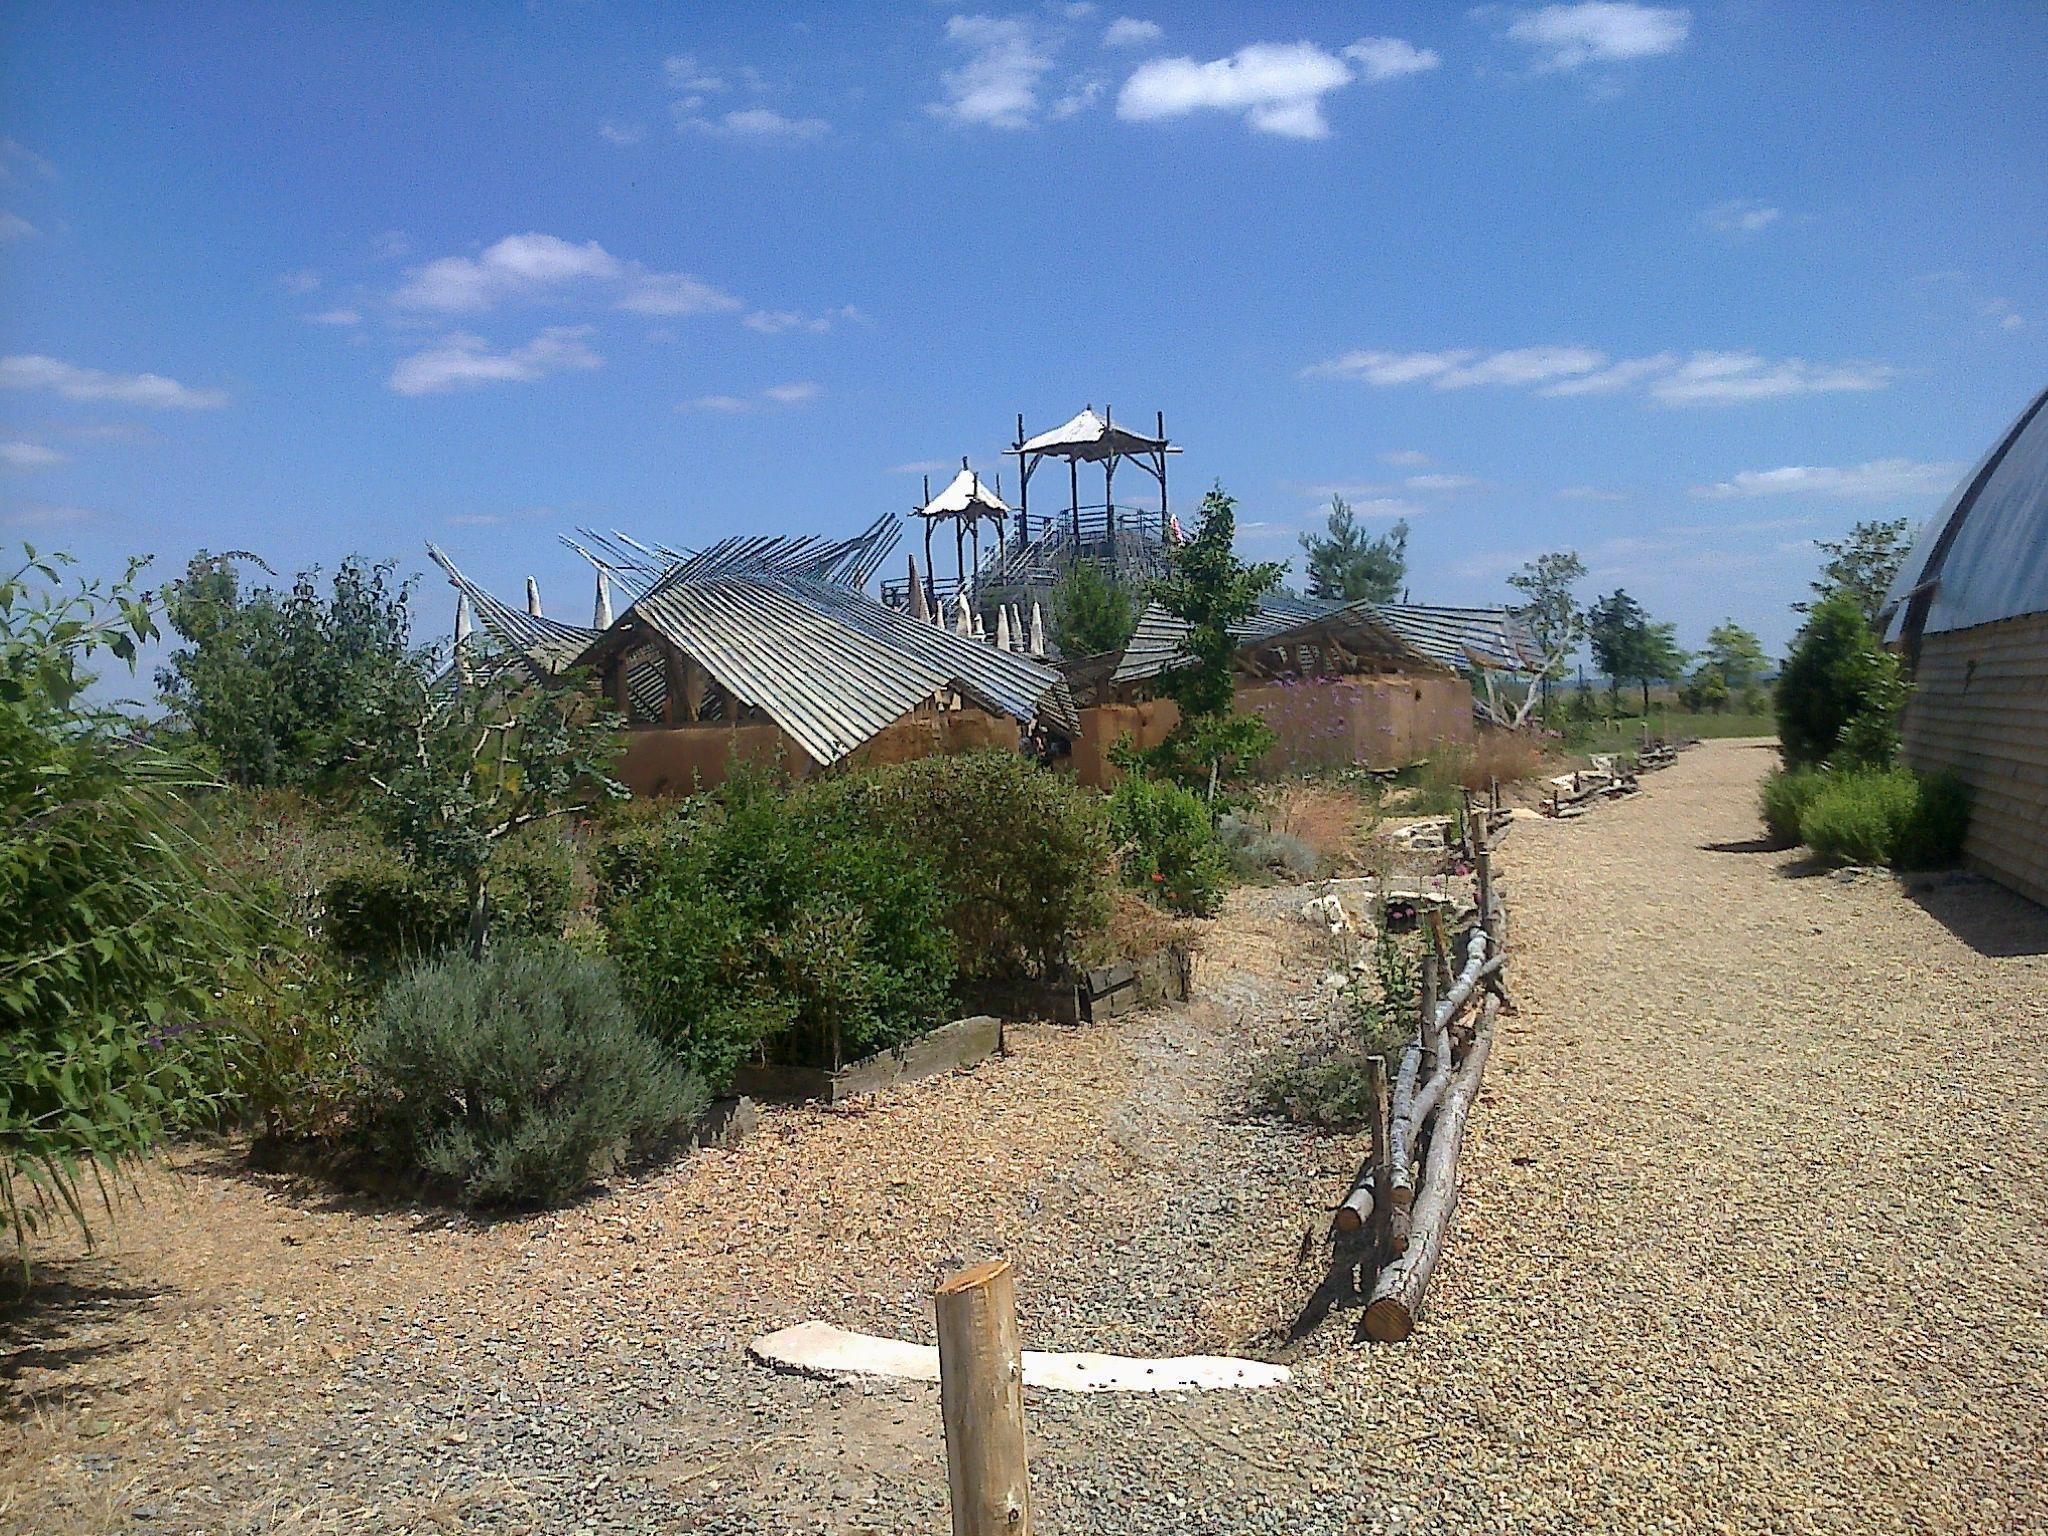 Le jardin toil kinya maruyama paimboeuf 44 for Jardin etoile paimboeuf